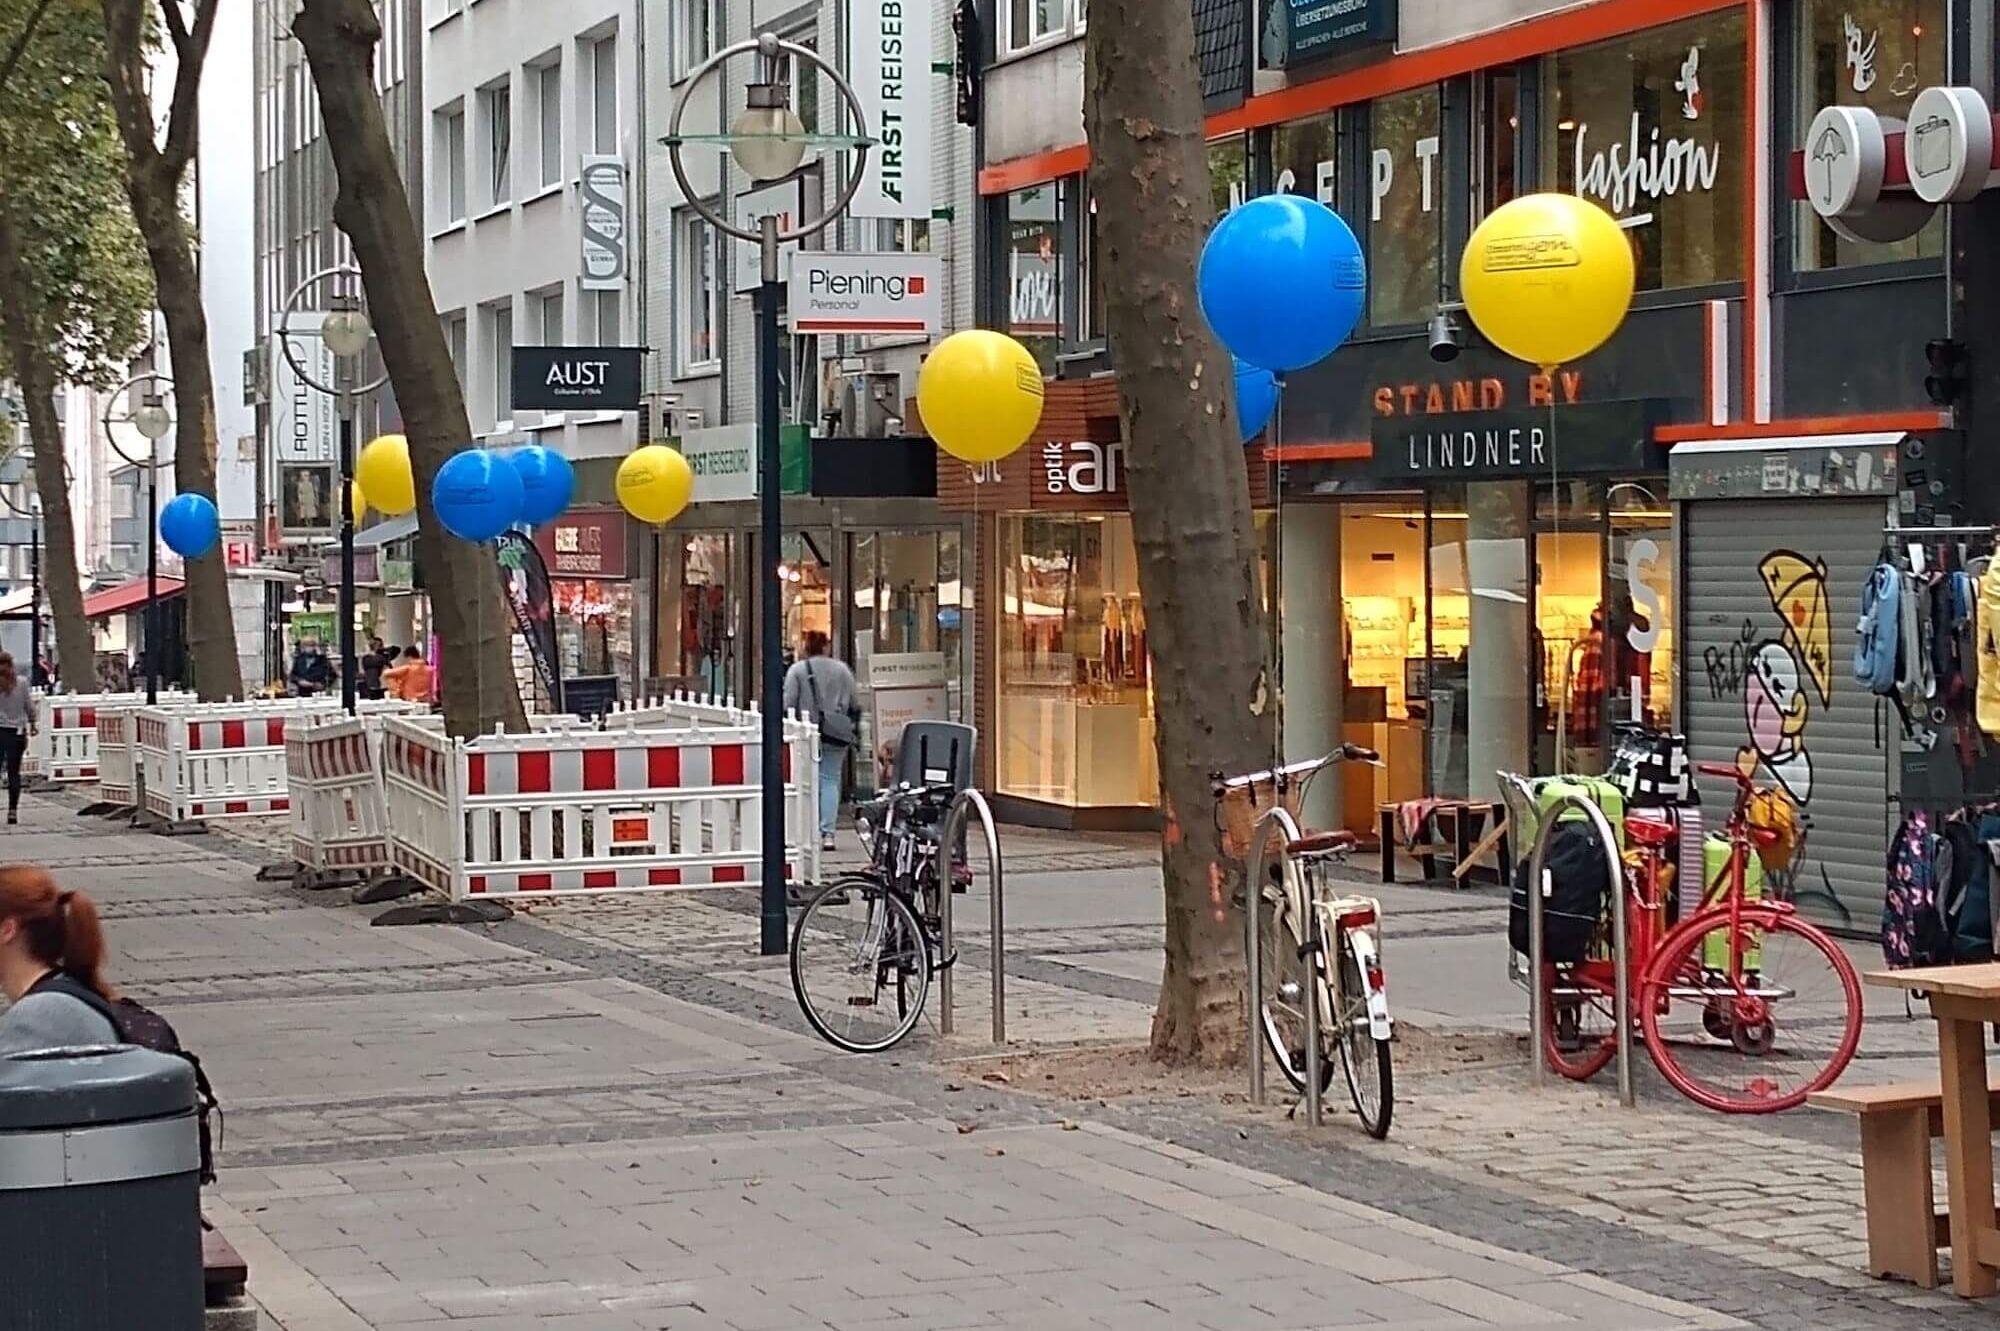 Ballon-Aktion Dortmund